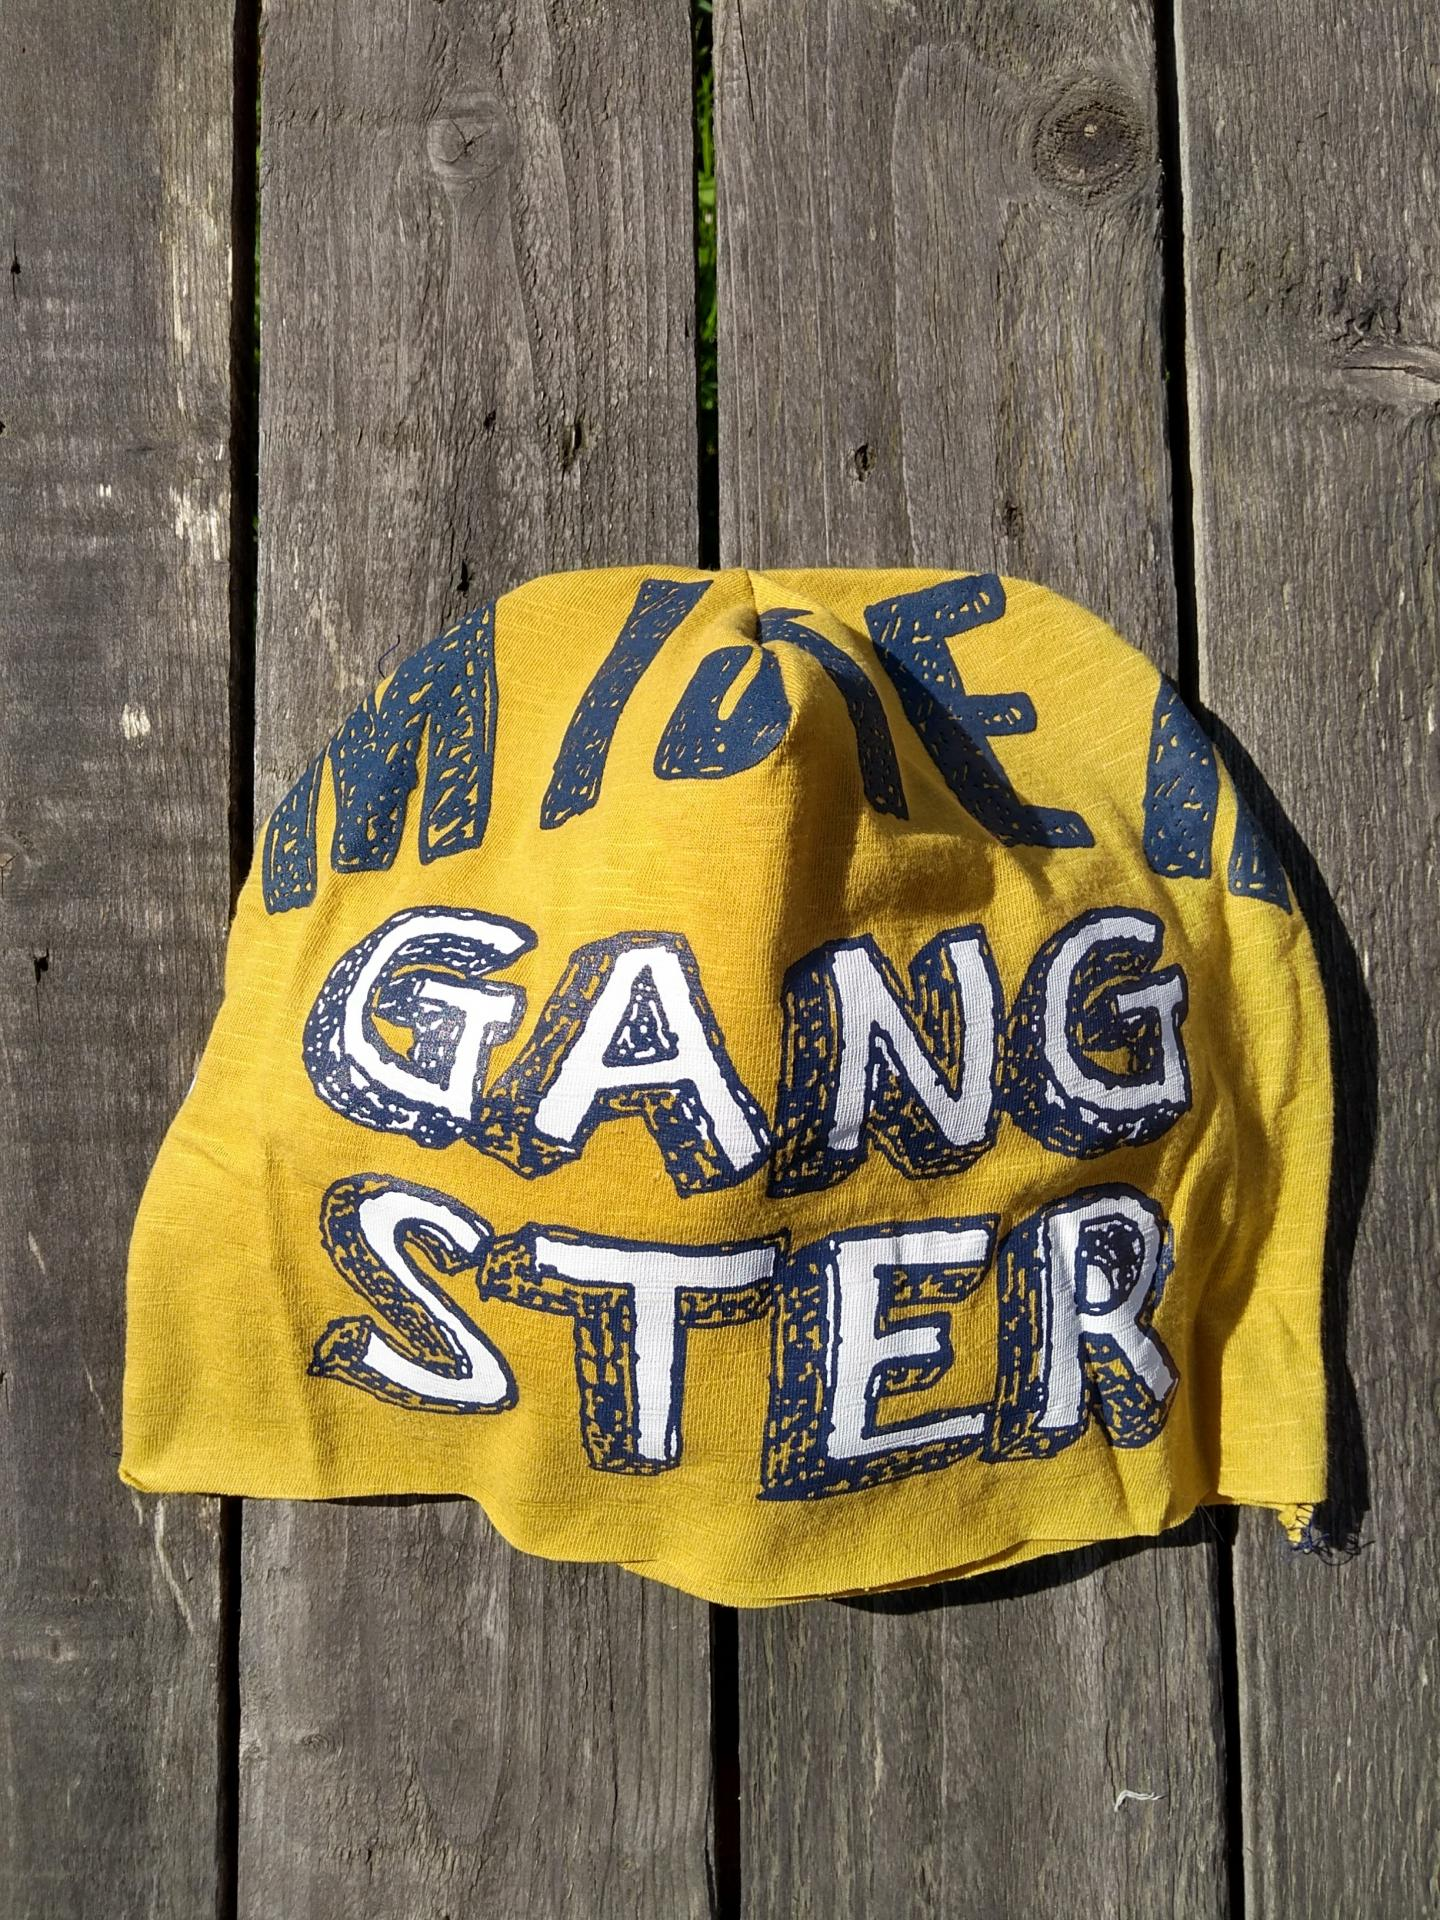 charlotte gangster